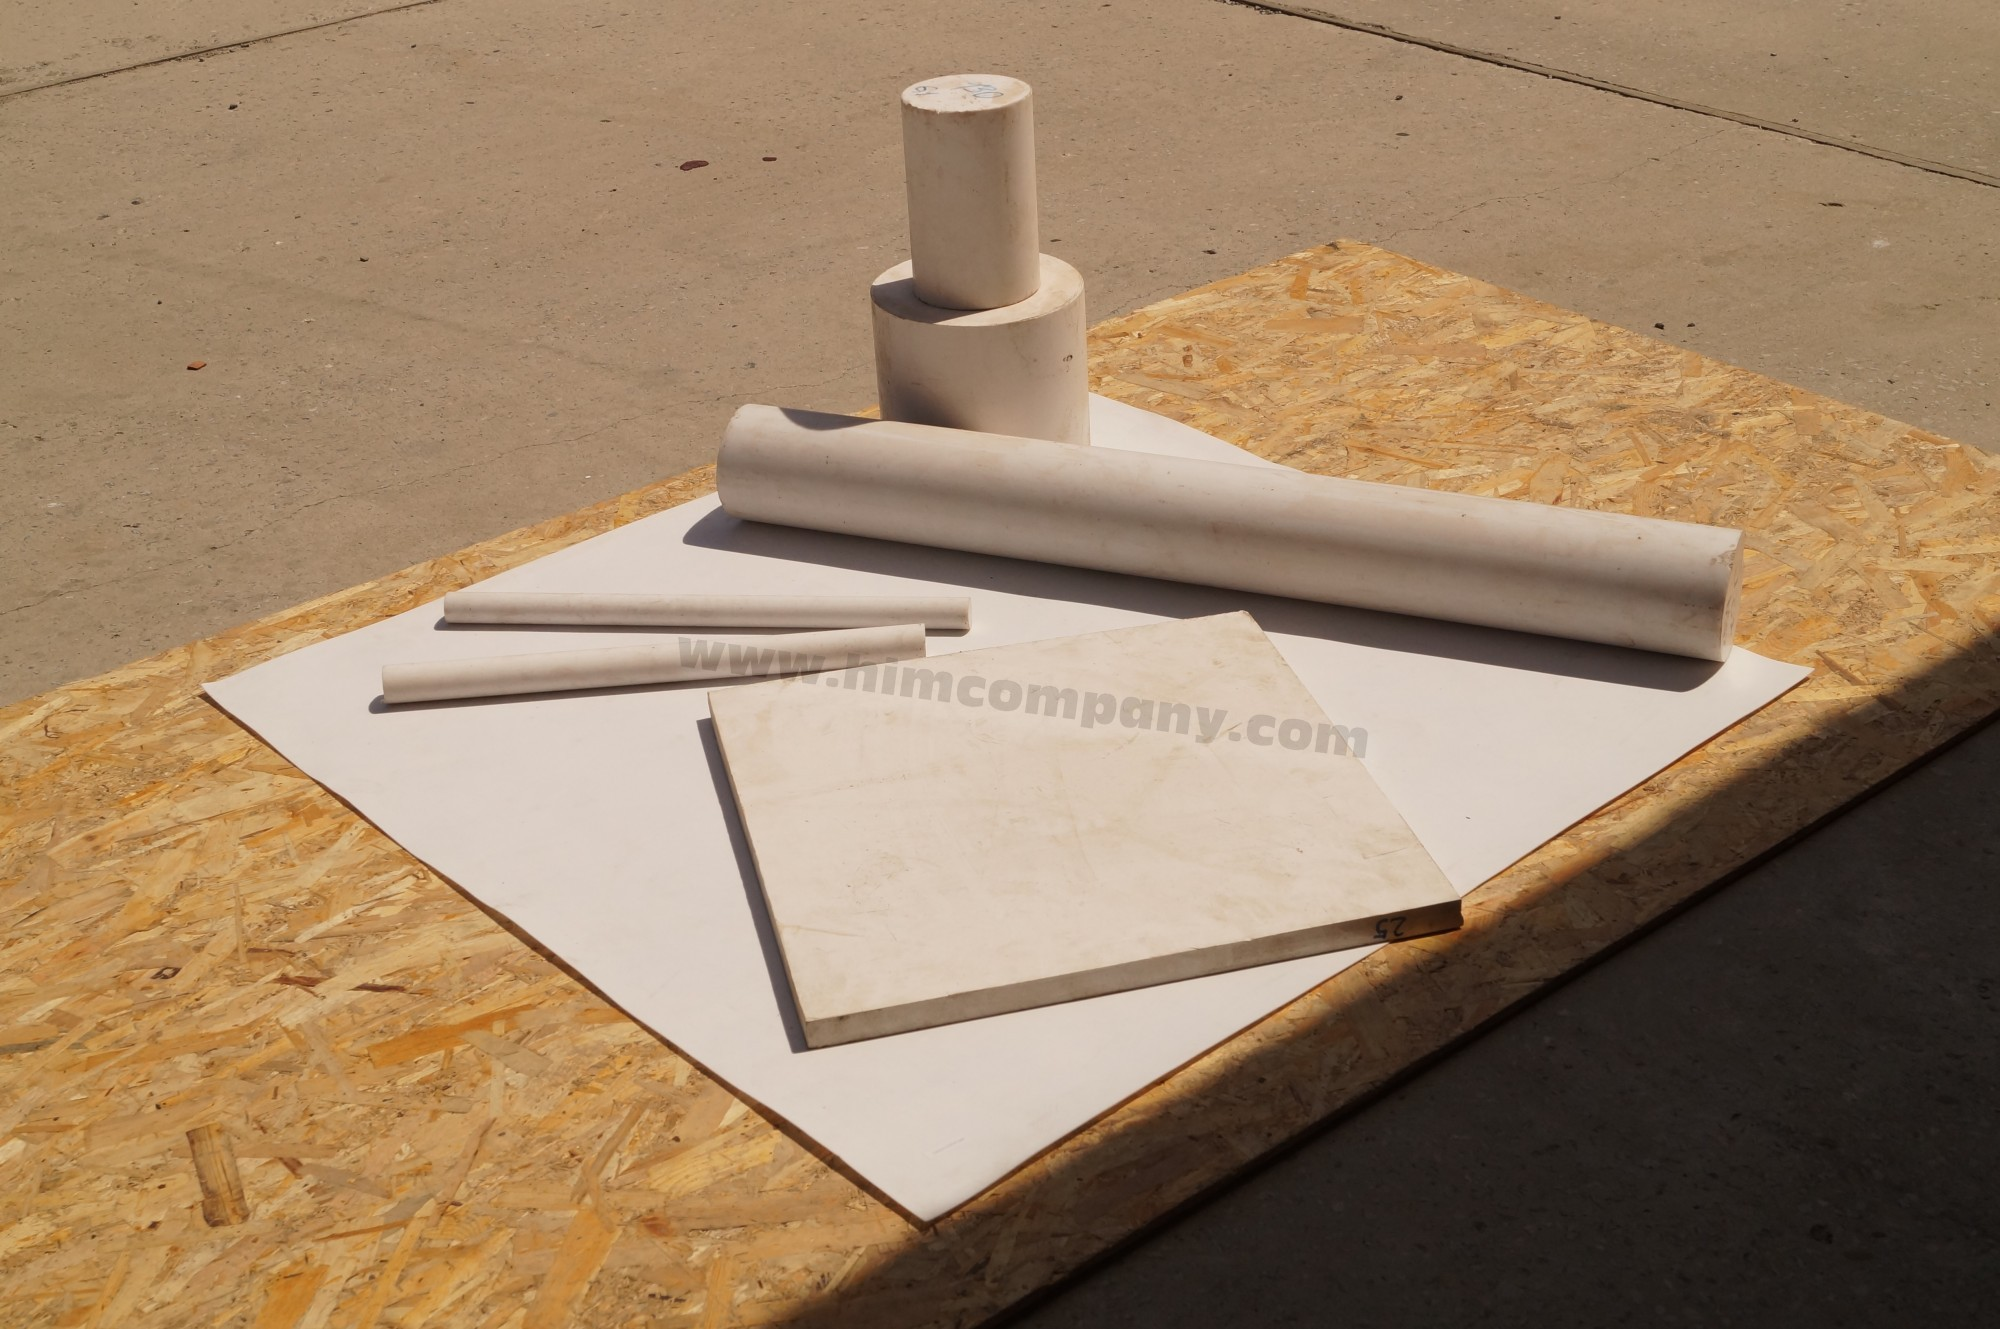 Фторопласт листовой 20 мм (1000х1000 мм, вес~45 кг.)